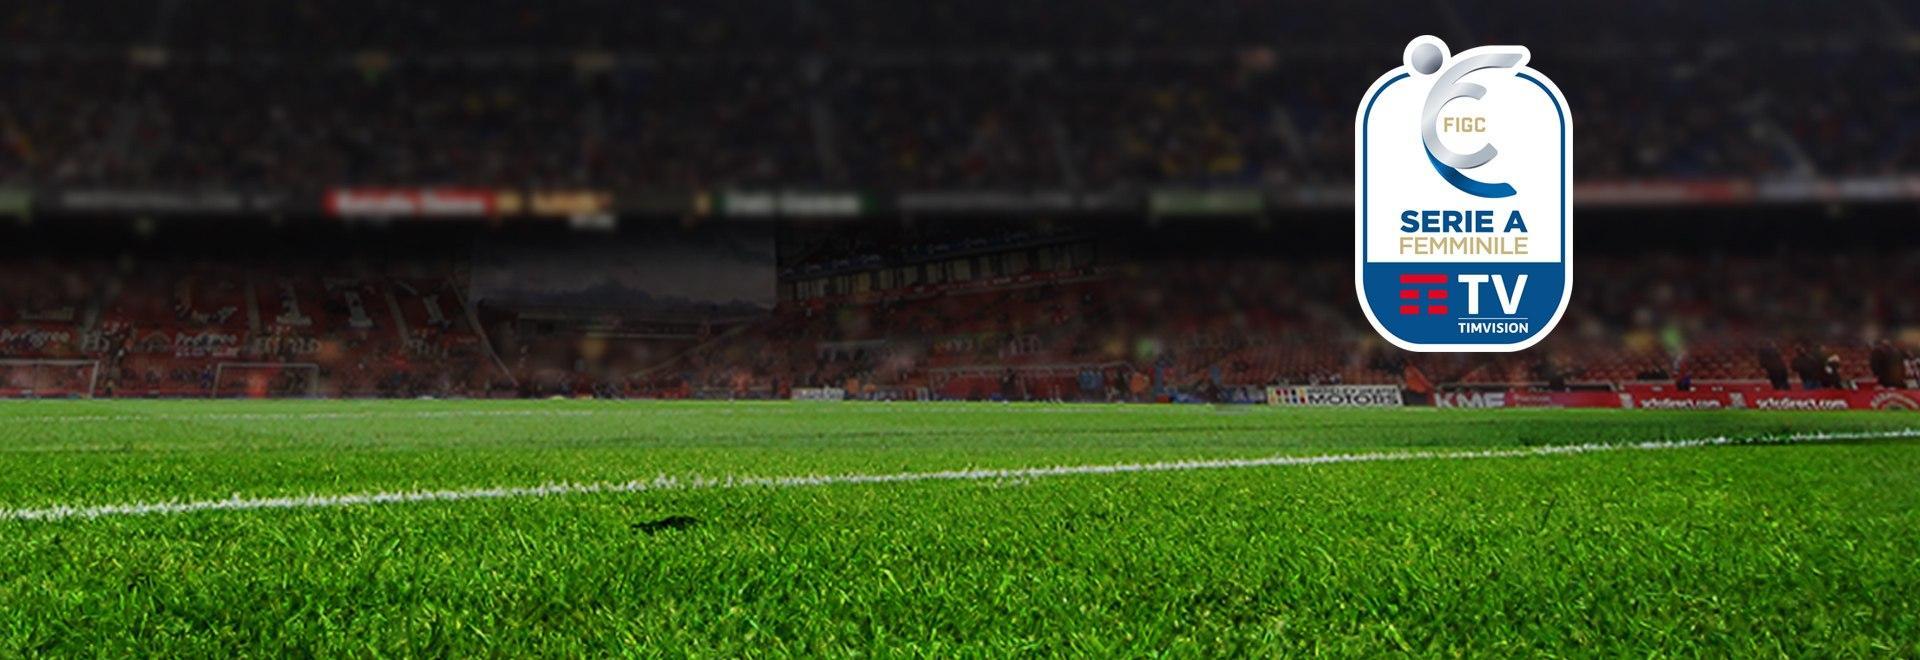 Inter - Roma. 9a g.